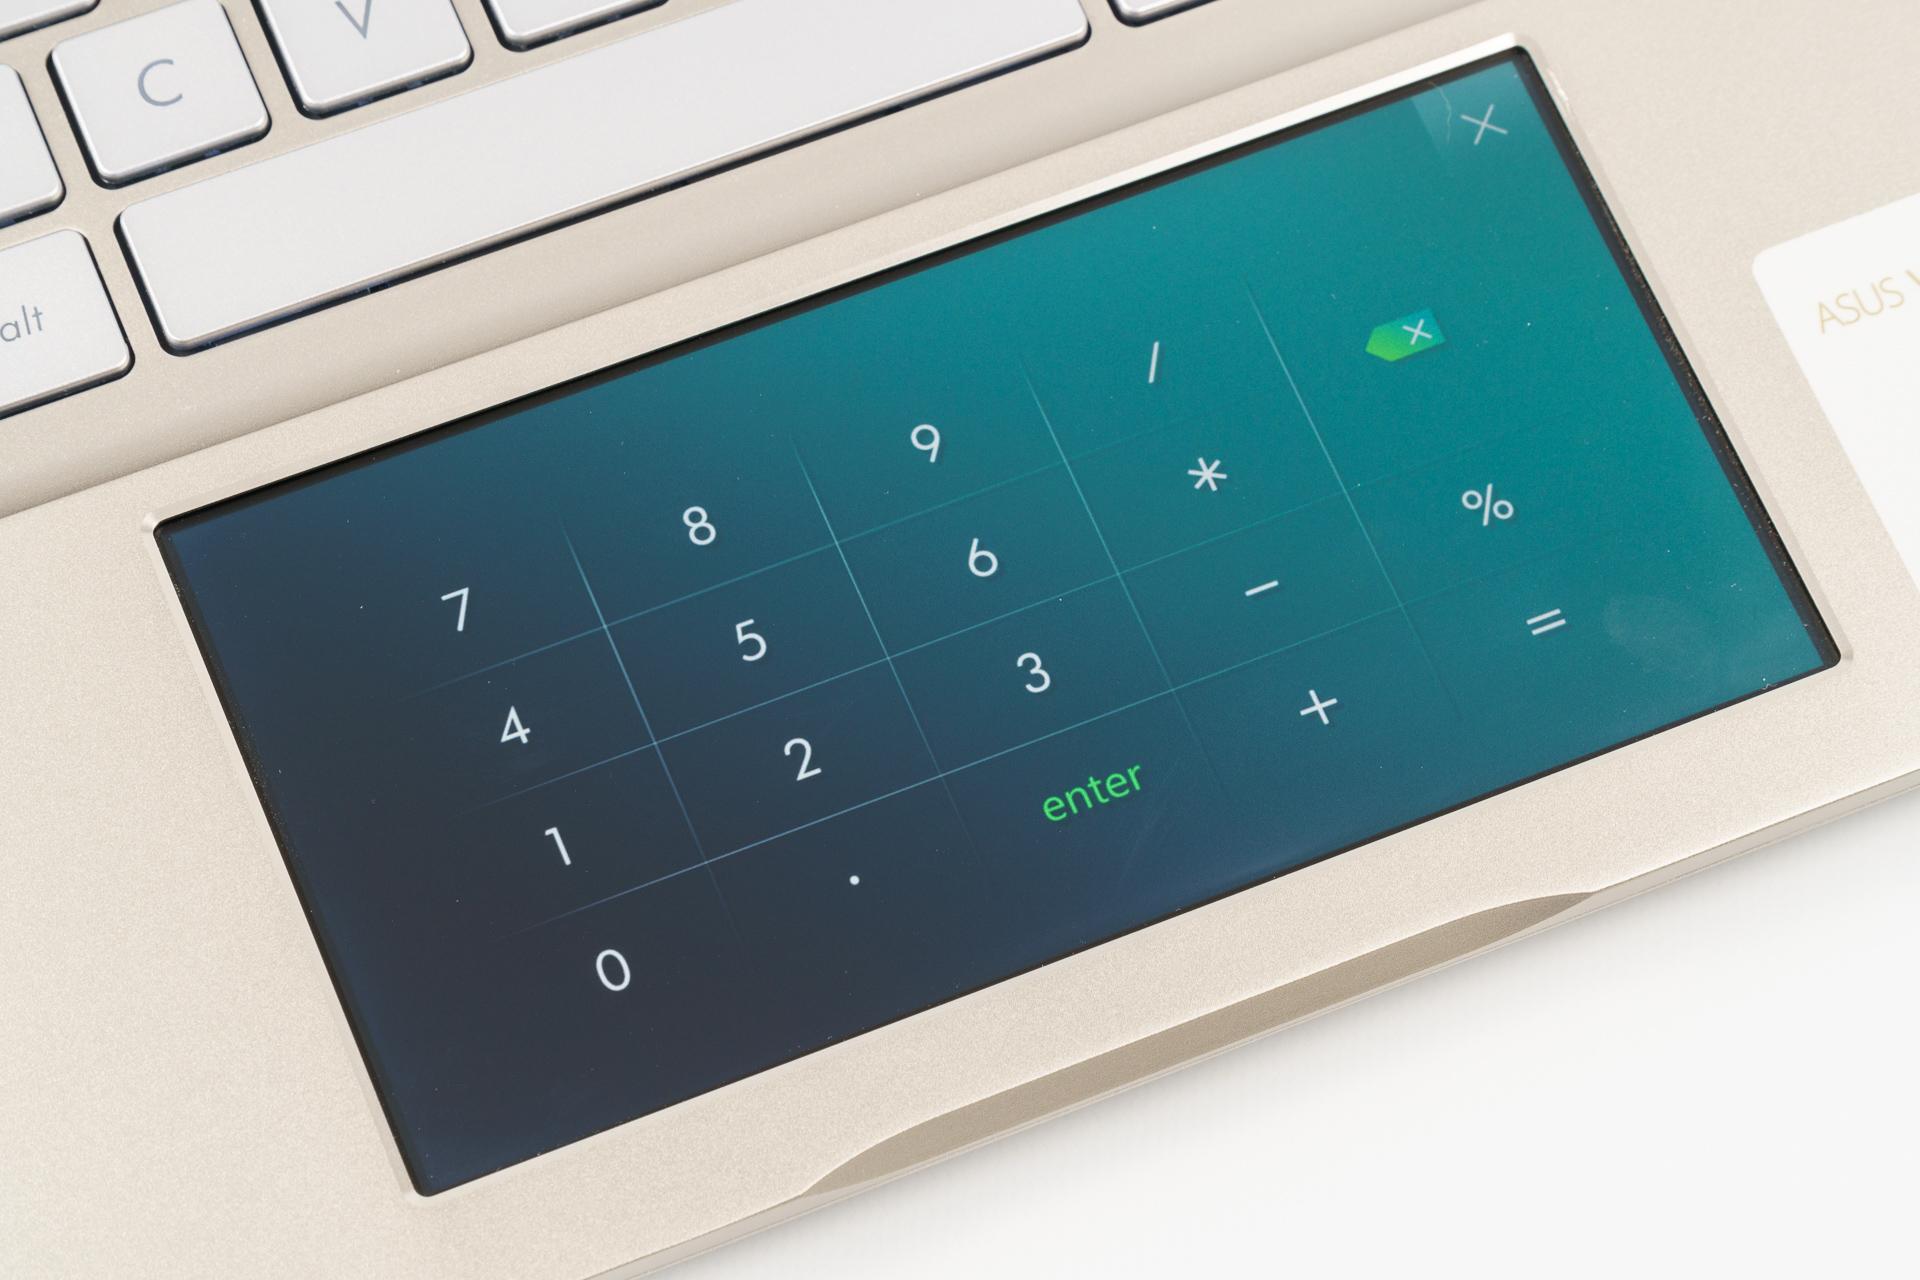 Asus VivoBook ze ScreenPadem, czyli po co w notebooku drugi ekran? 23